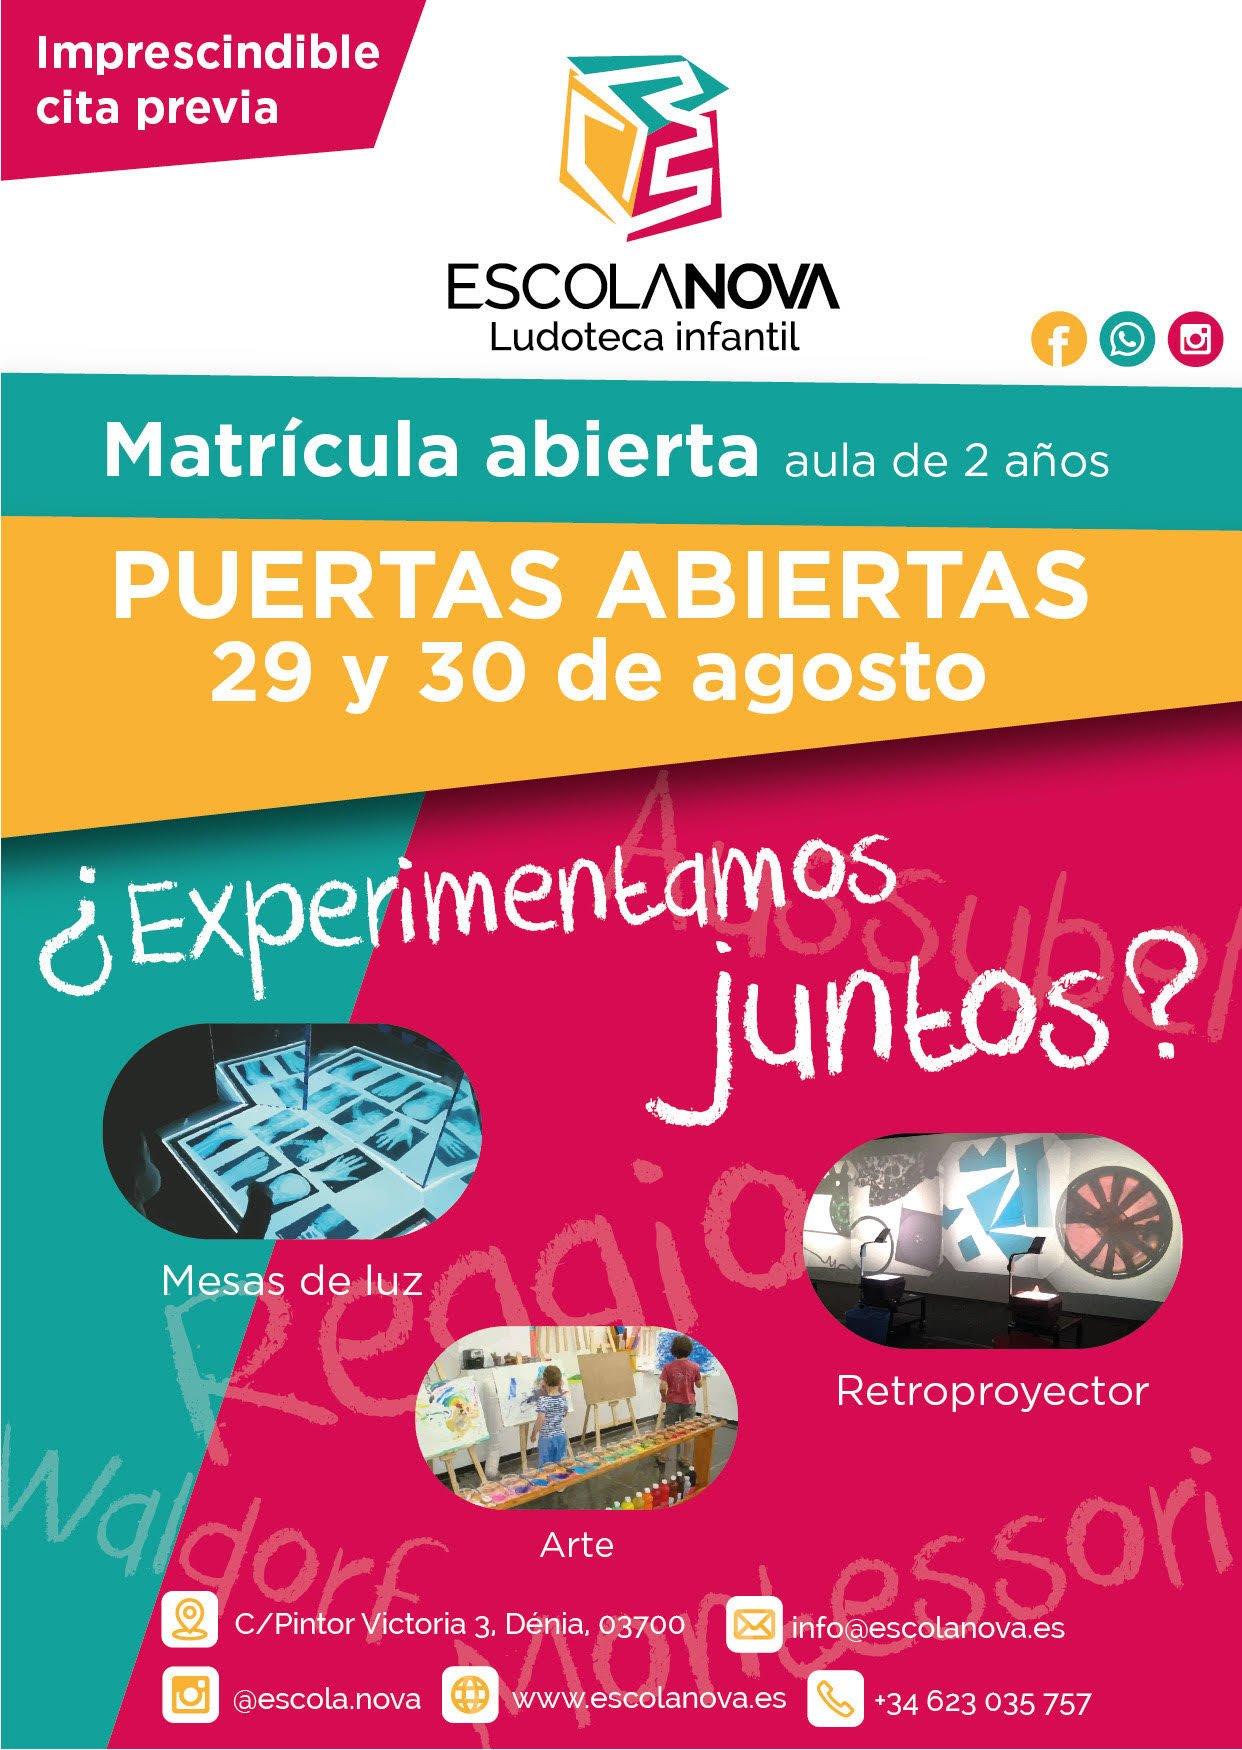 Flyer puertas abiertas Escolanova